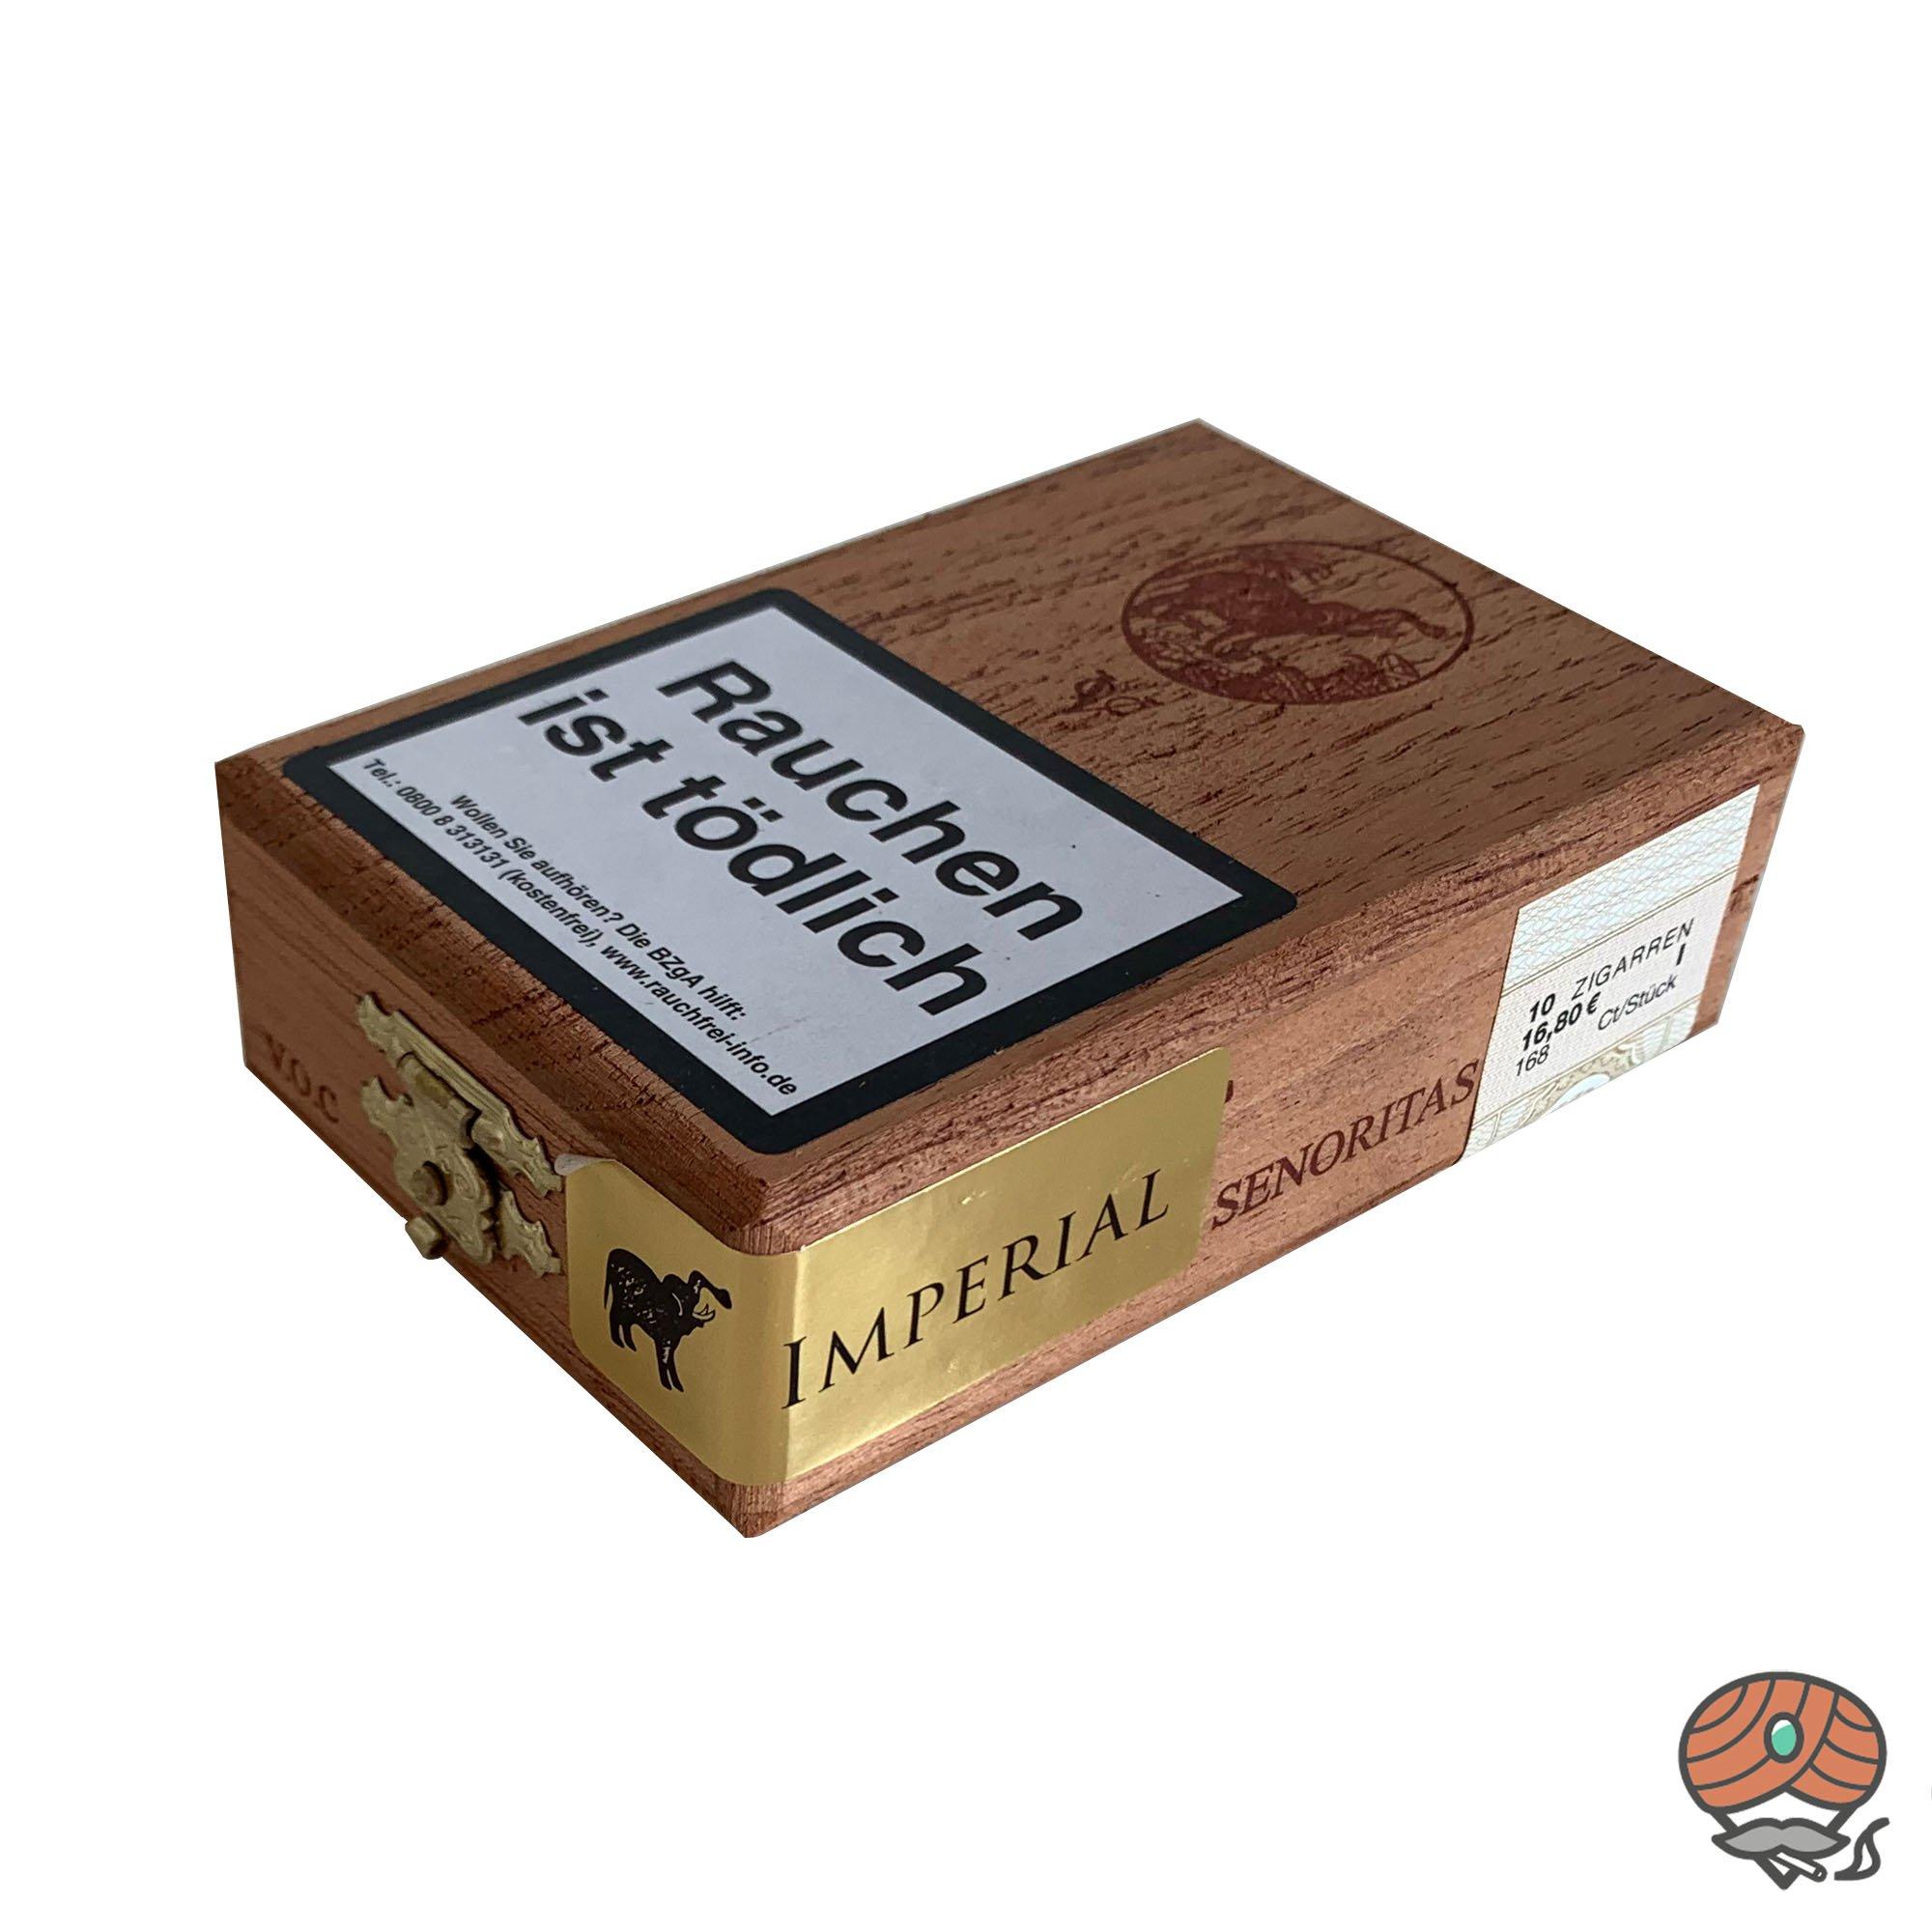 De Olifant Classic V.O.C Senoritas Imperial Zigarren